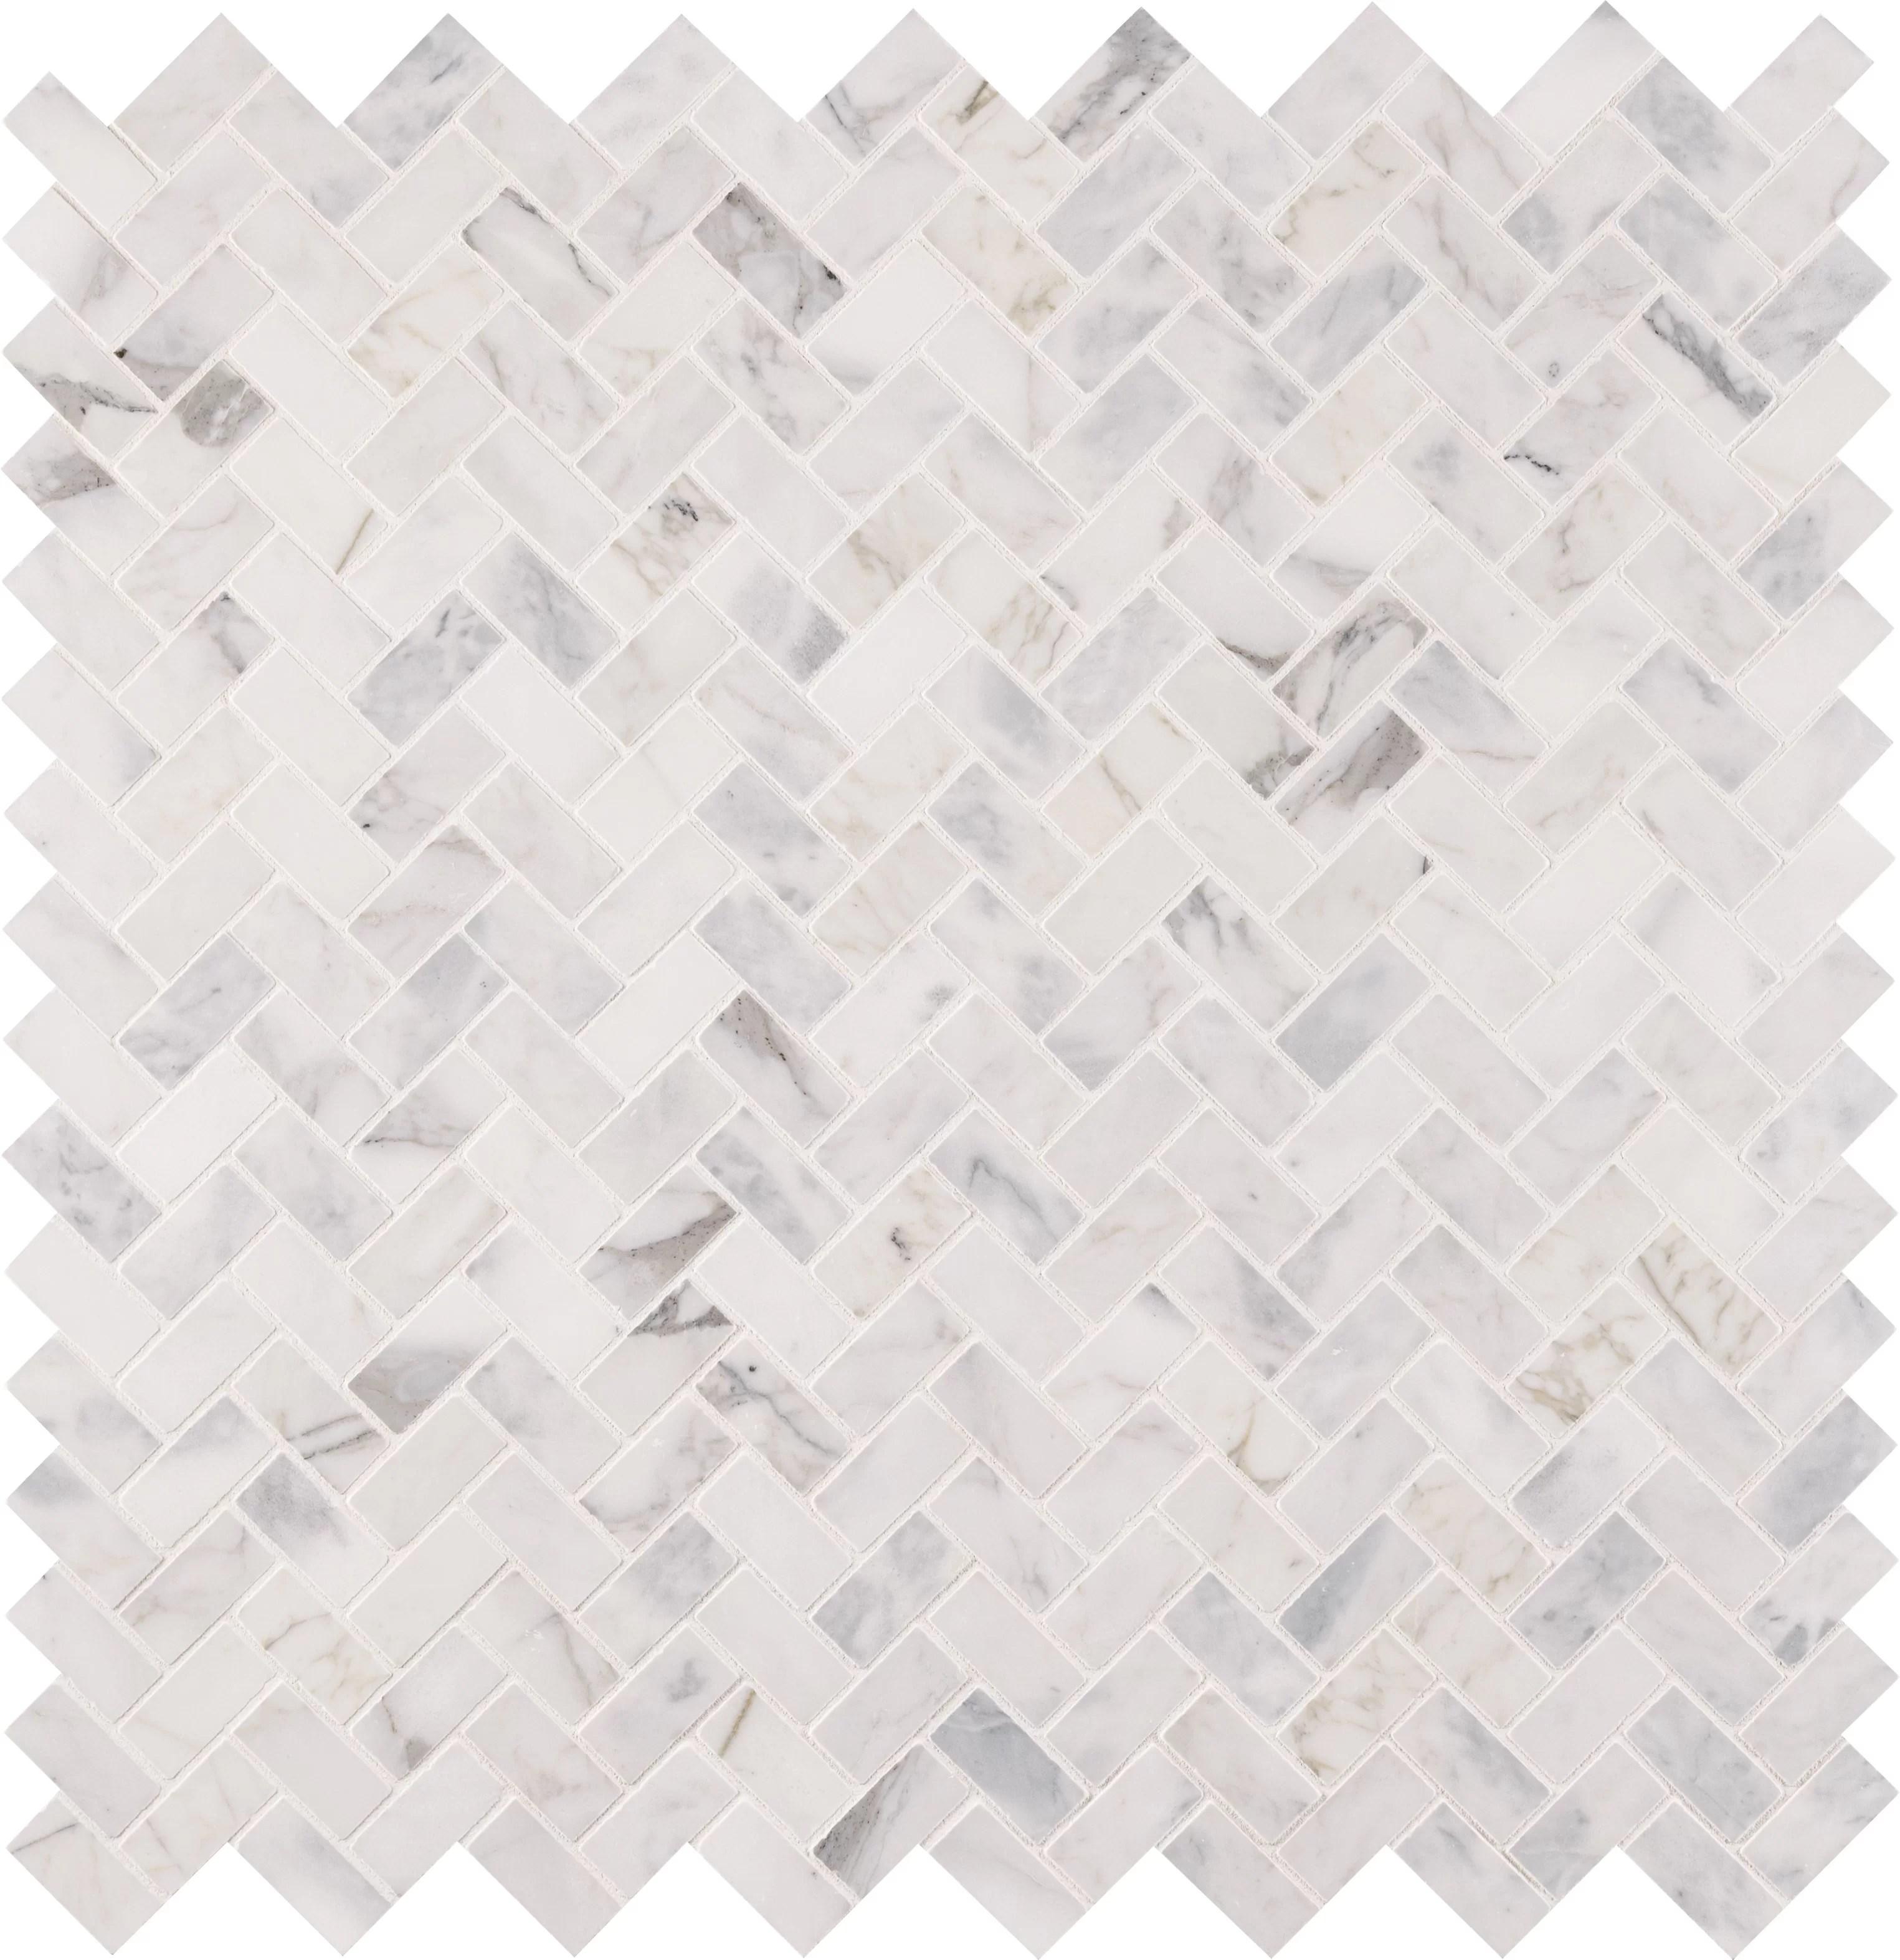 msi calacatta cressa 1 x 2 natural stone herringbone chevron mosaic wall floor tile reviews wayfair